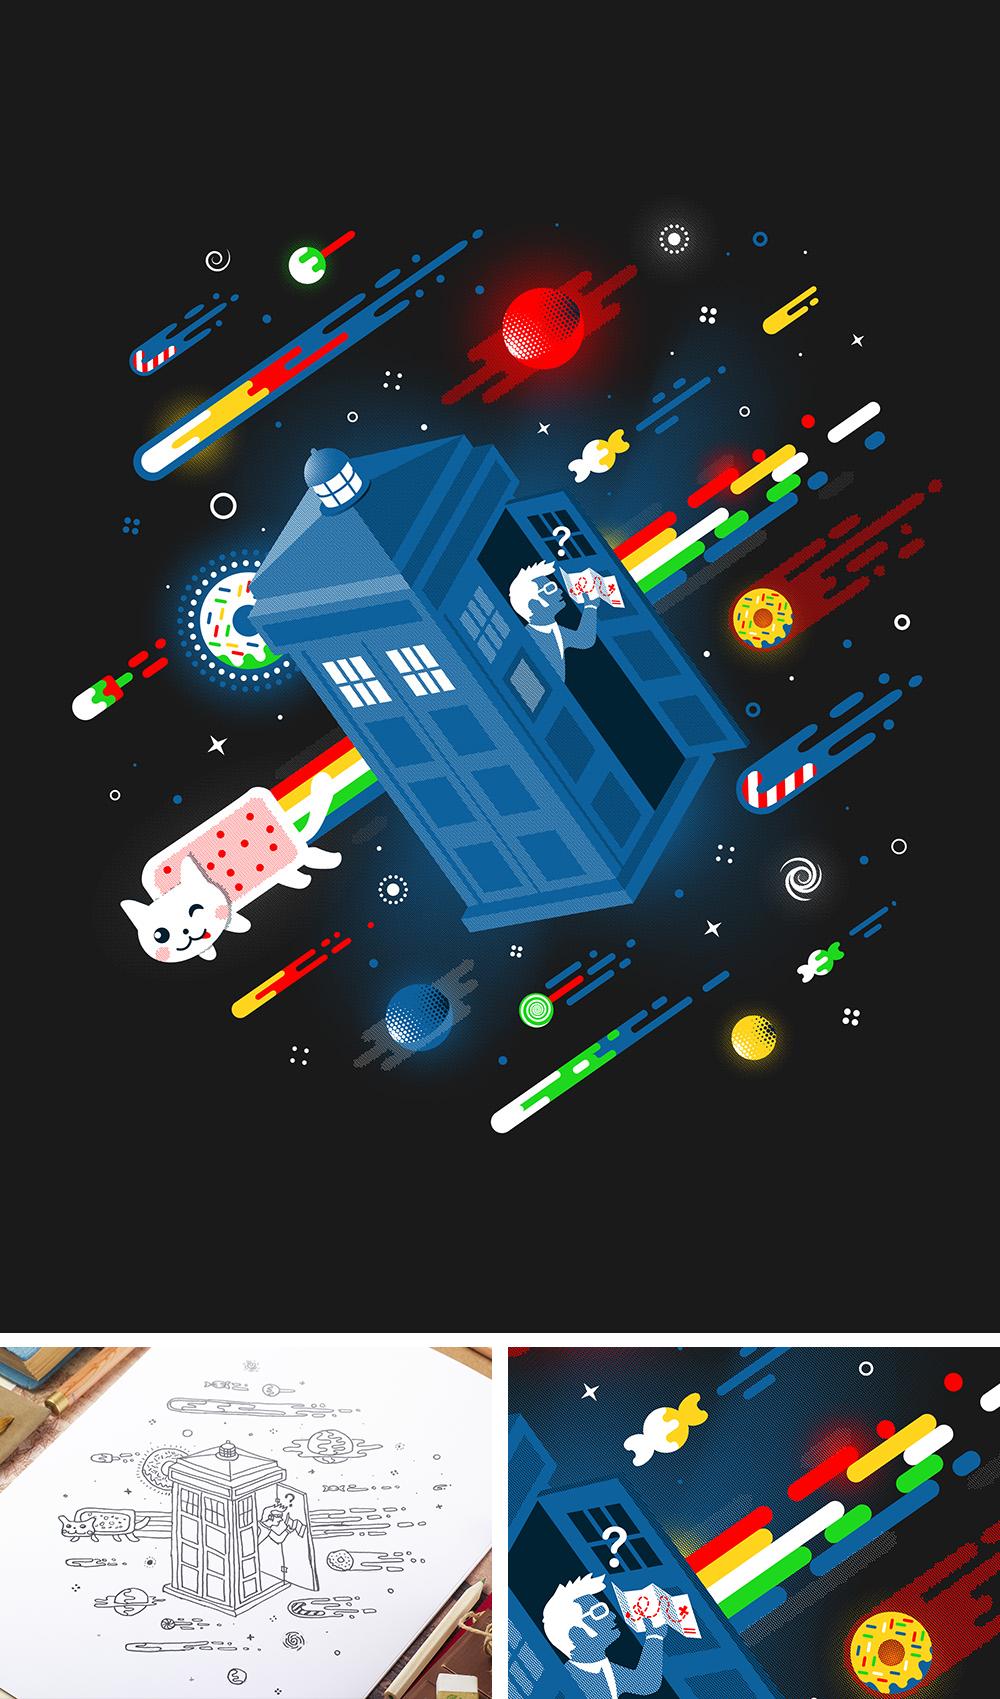 Fan Art,hyperlixir,Parody,mashup,nyan cat,Doctor Who,Green Lantern,razer,aya,rurouni kenshin,sailor moon,Chrono Trigger,print,shirt